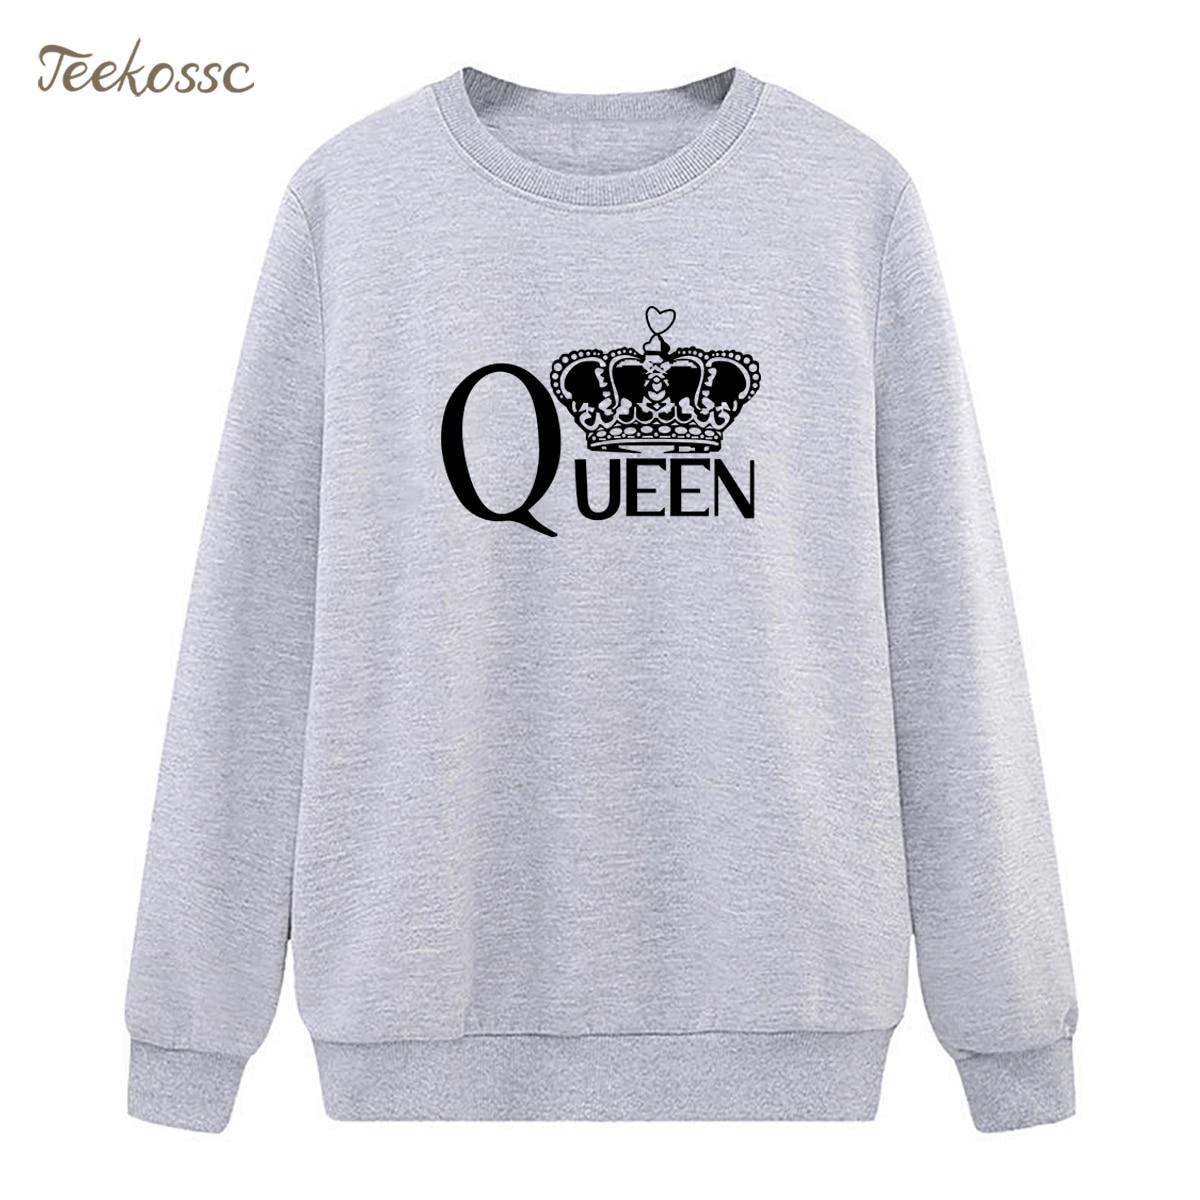 Queen Crown Sweatshirts Womens Gray Casual Hoodies 2018 Hot Sale Winter Autumn Lady Pullover Loose Fleece Hipster Sportswear XXL